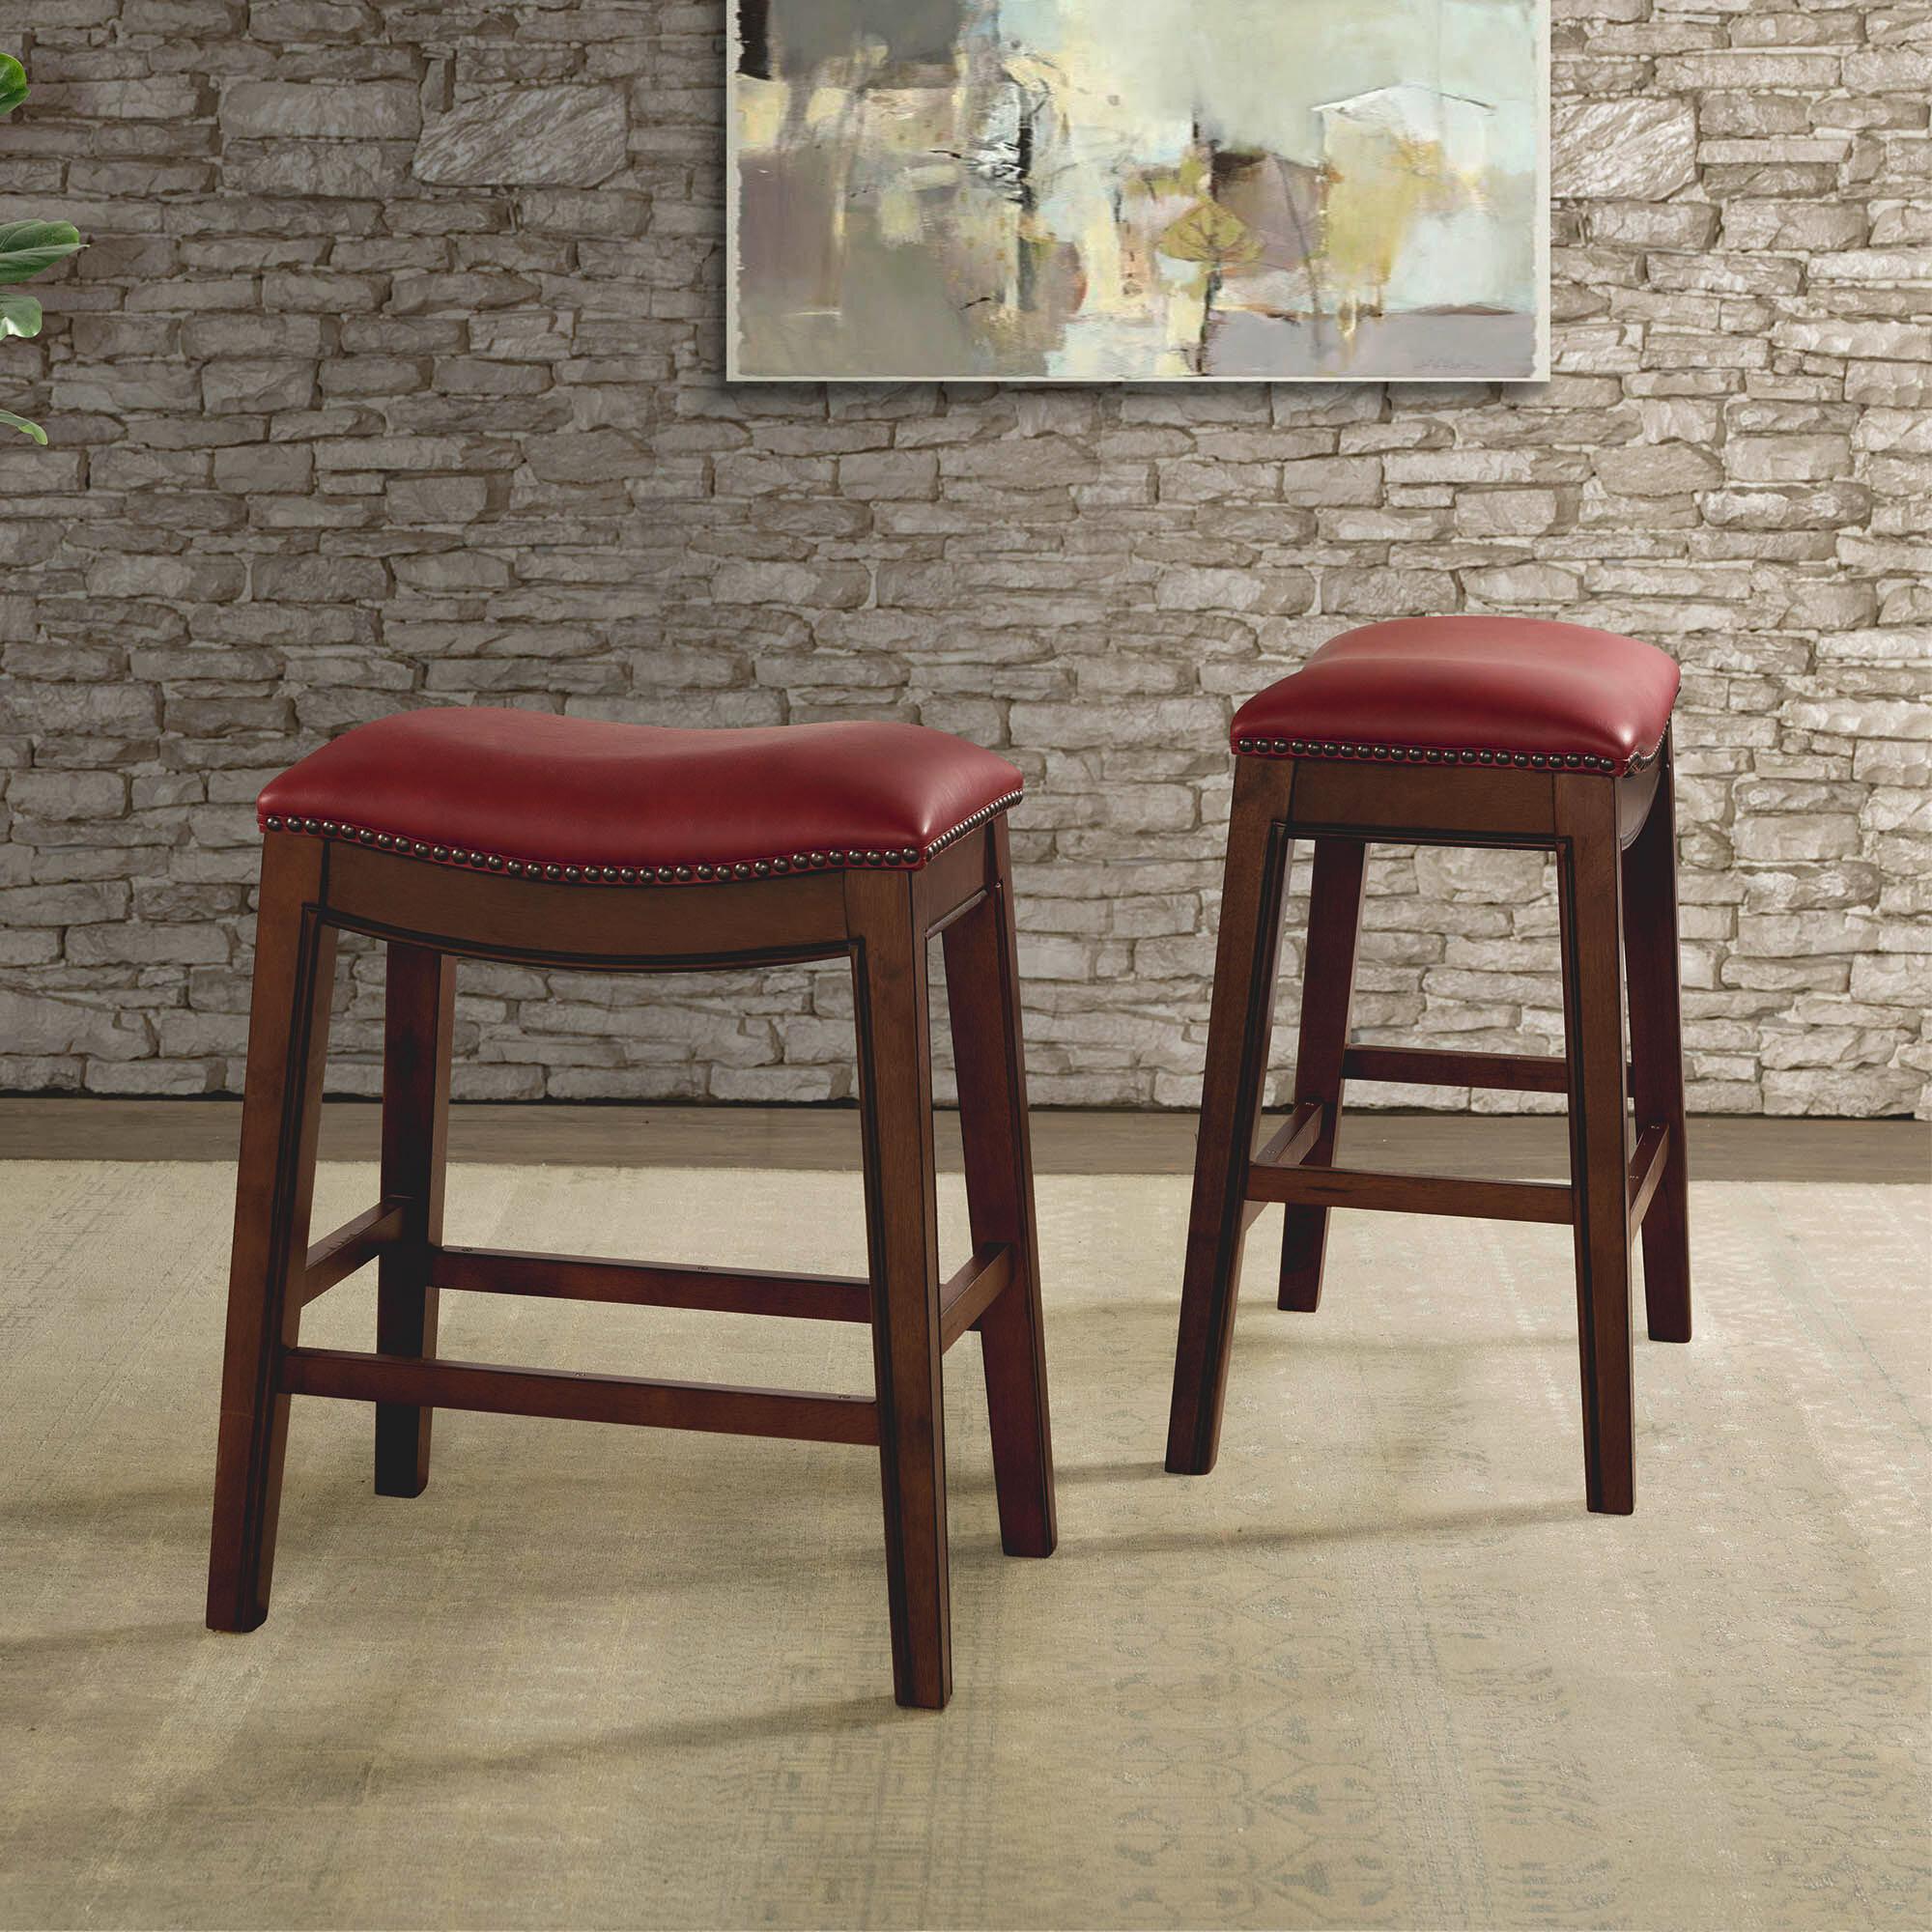 Swell Ottawa Backless 24 Bar Stool Theyellowbook Wood Chair Design Ideas Theyellowbookinfo